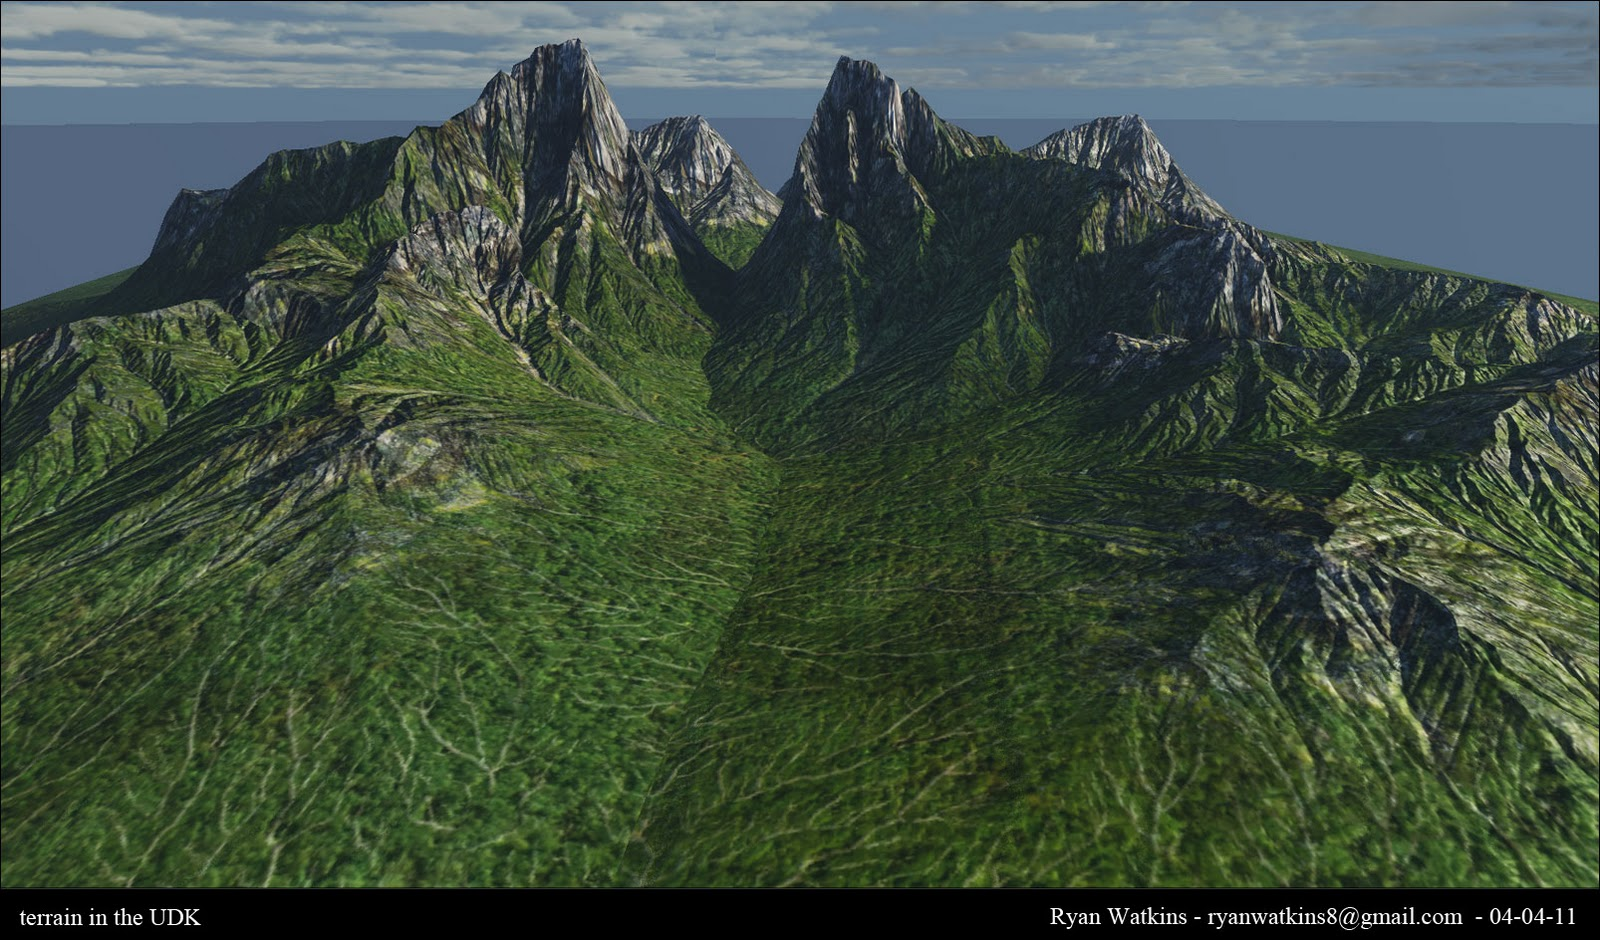 http://4.bp.blogspot.com/-o9rwpzjvXeQ/TZpnnIFWX1I/AAAAAAAAACk/Ehe6yDAOErI/s1600/terrain_udk.jpg